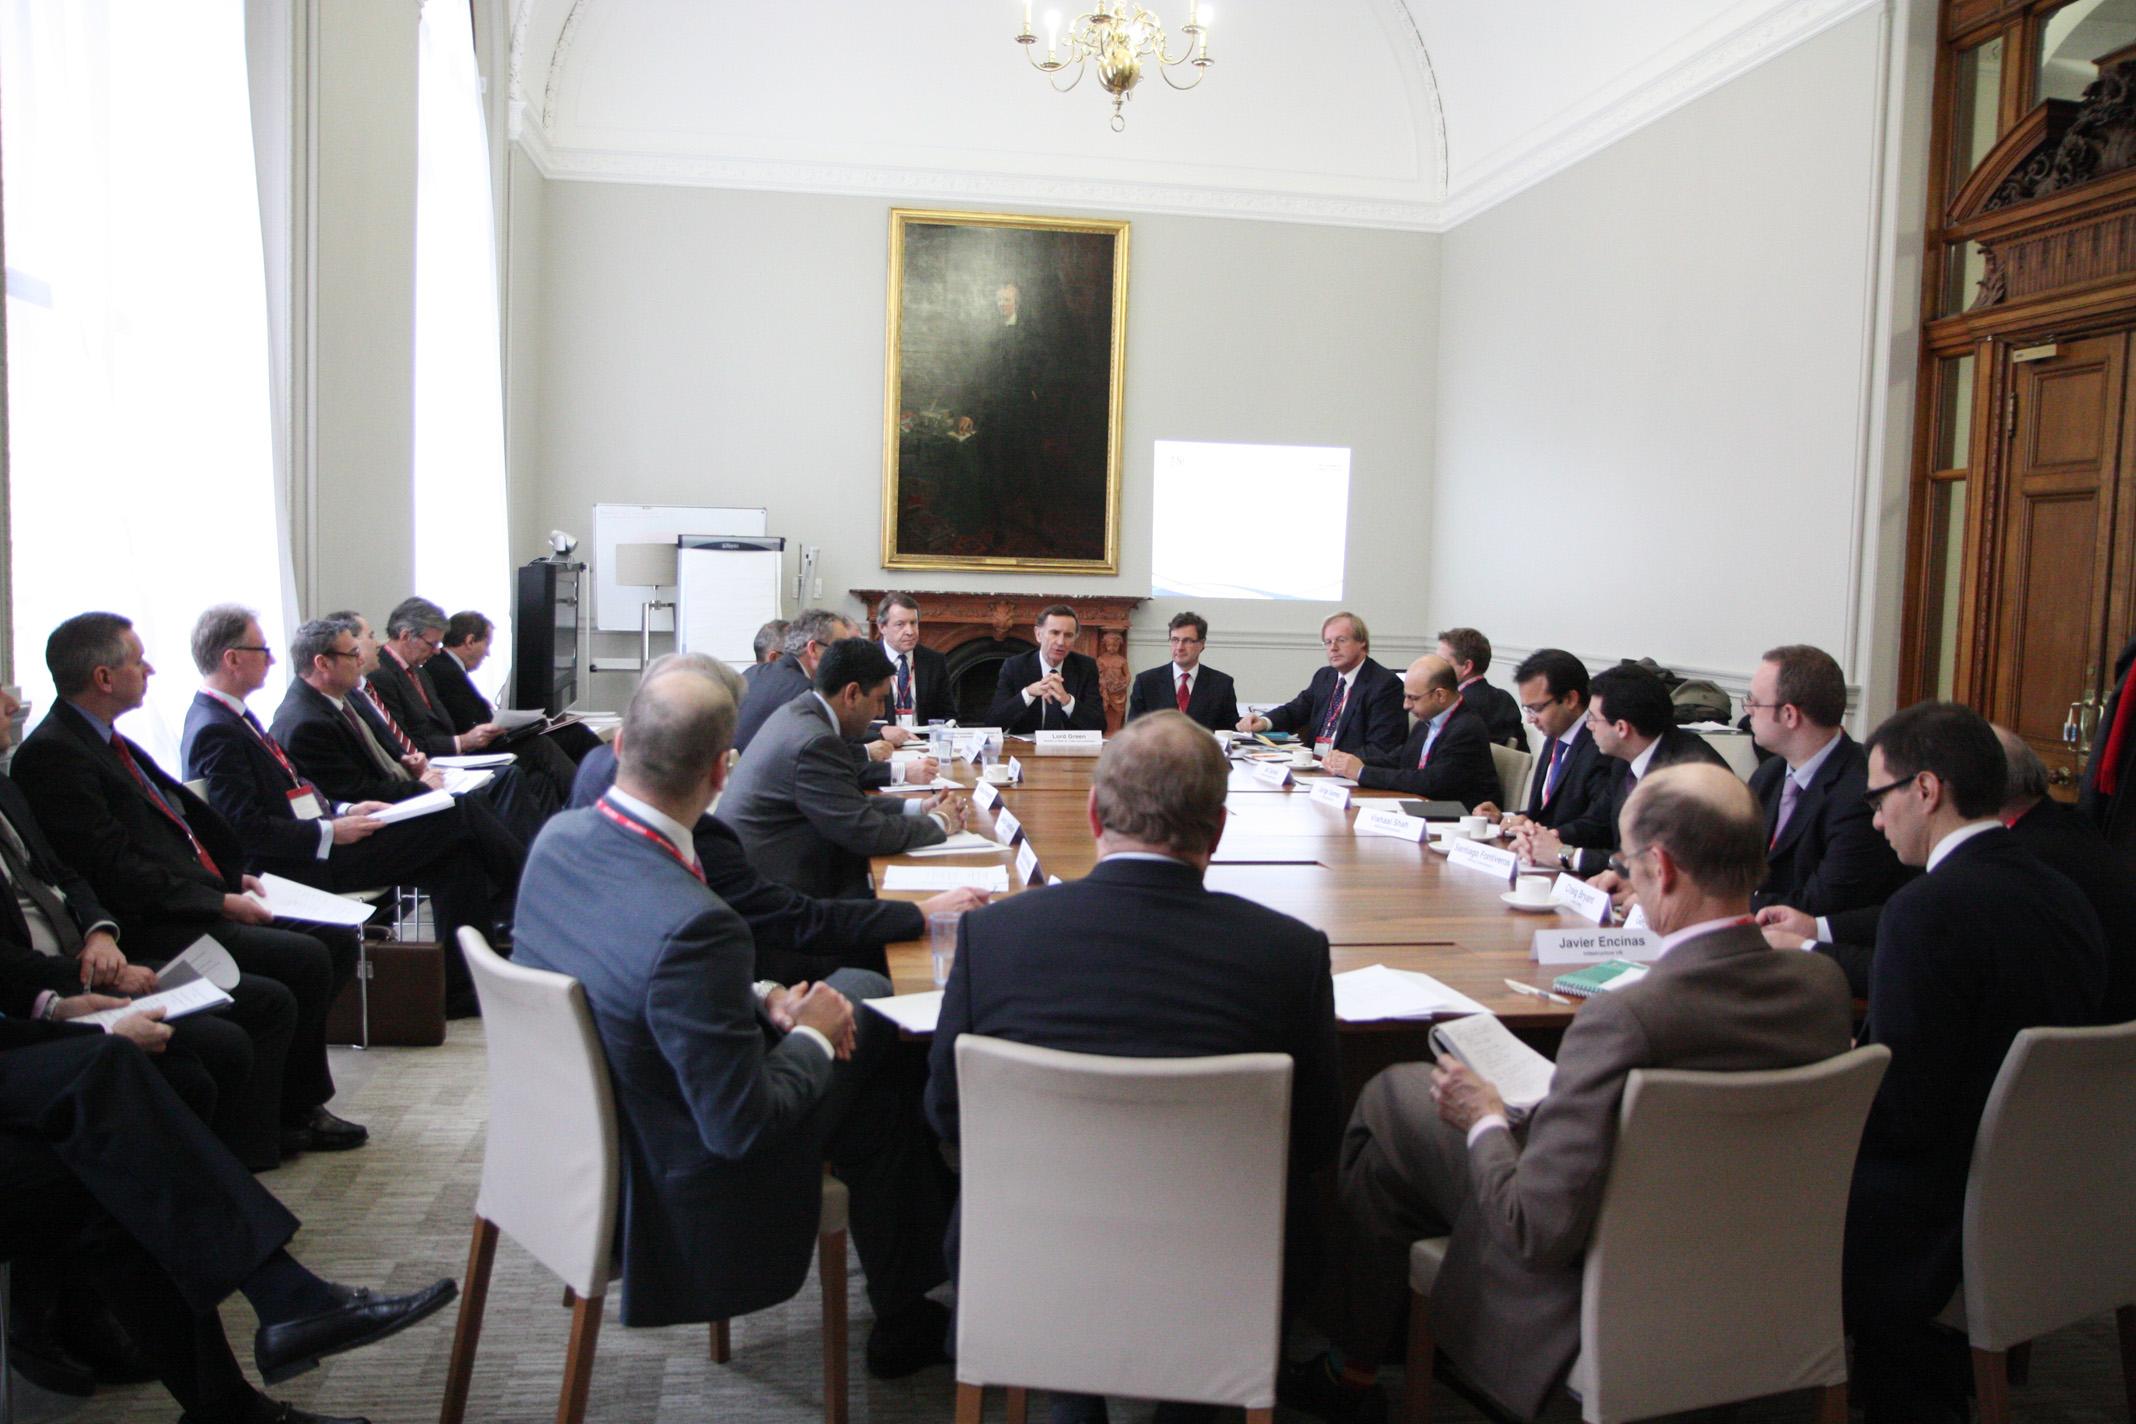 Resultado de imagen para business roundtable images